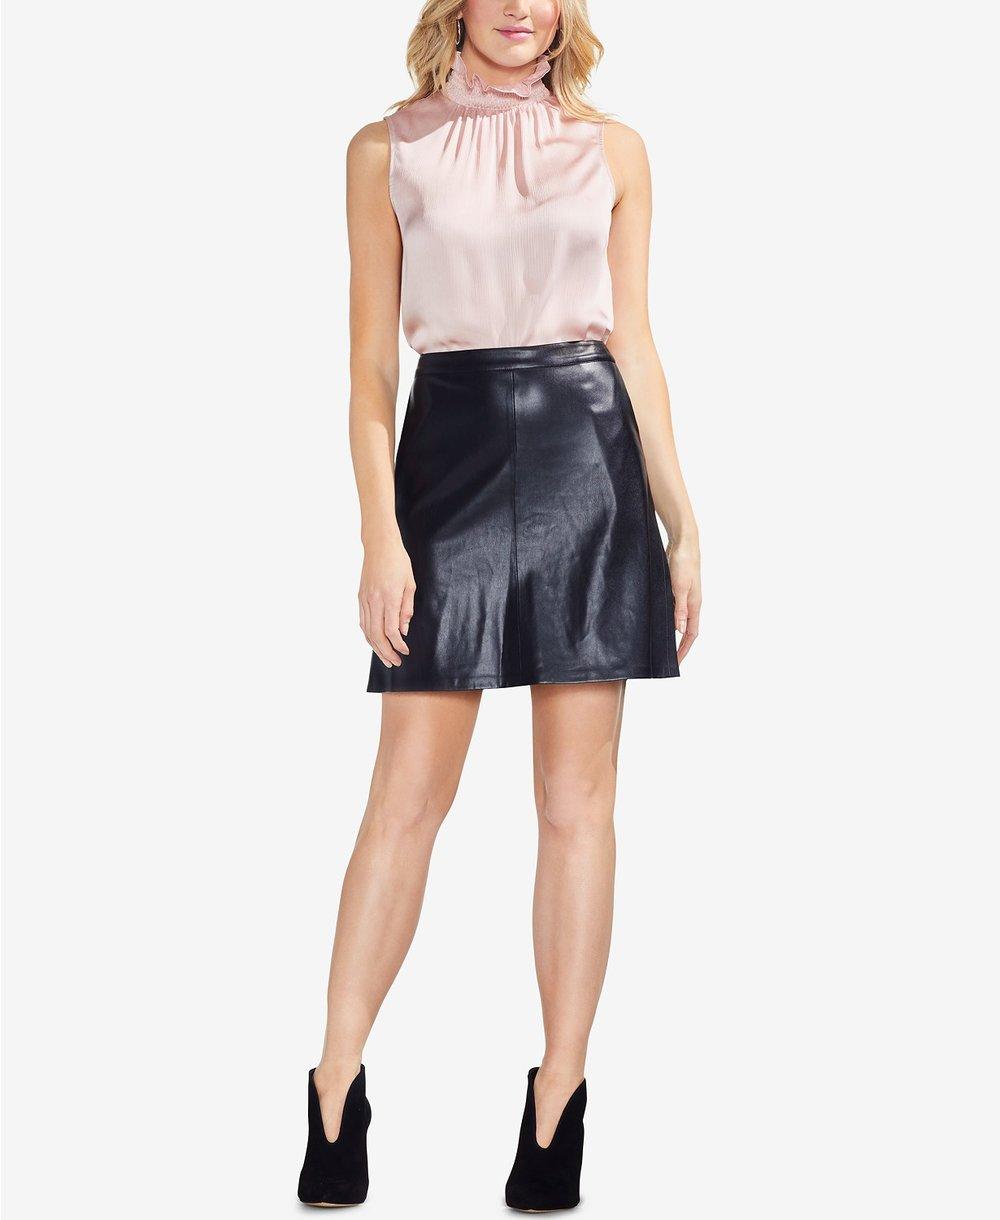 Vince Camuto     Faux-Leather Mini Skirt. Macys. $79.